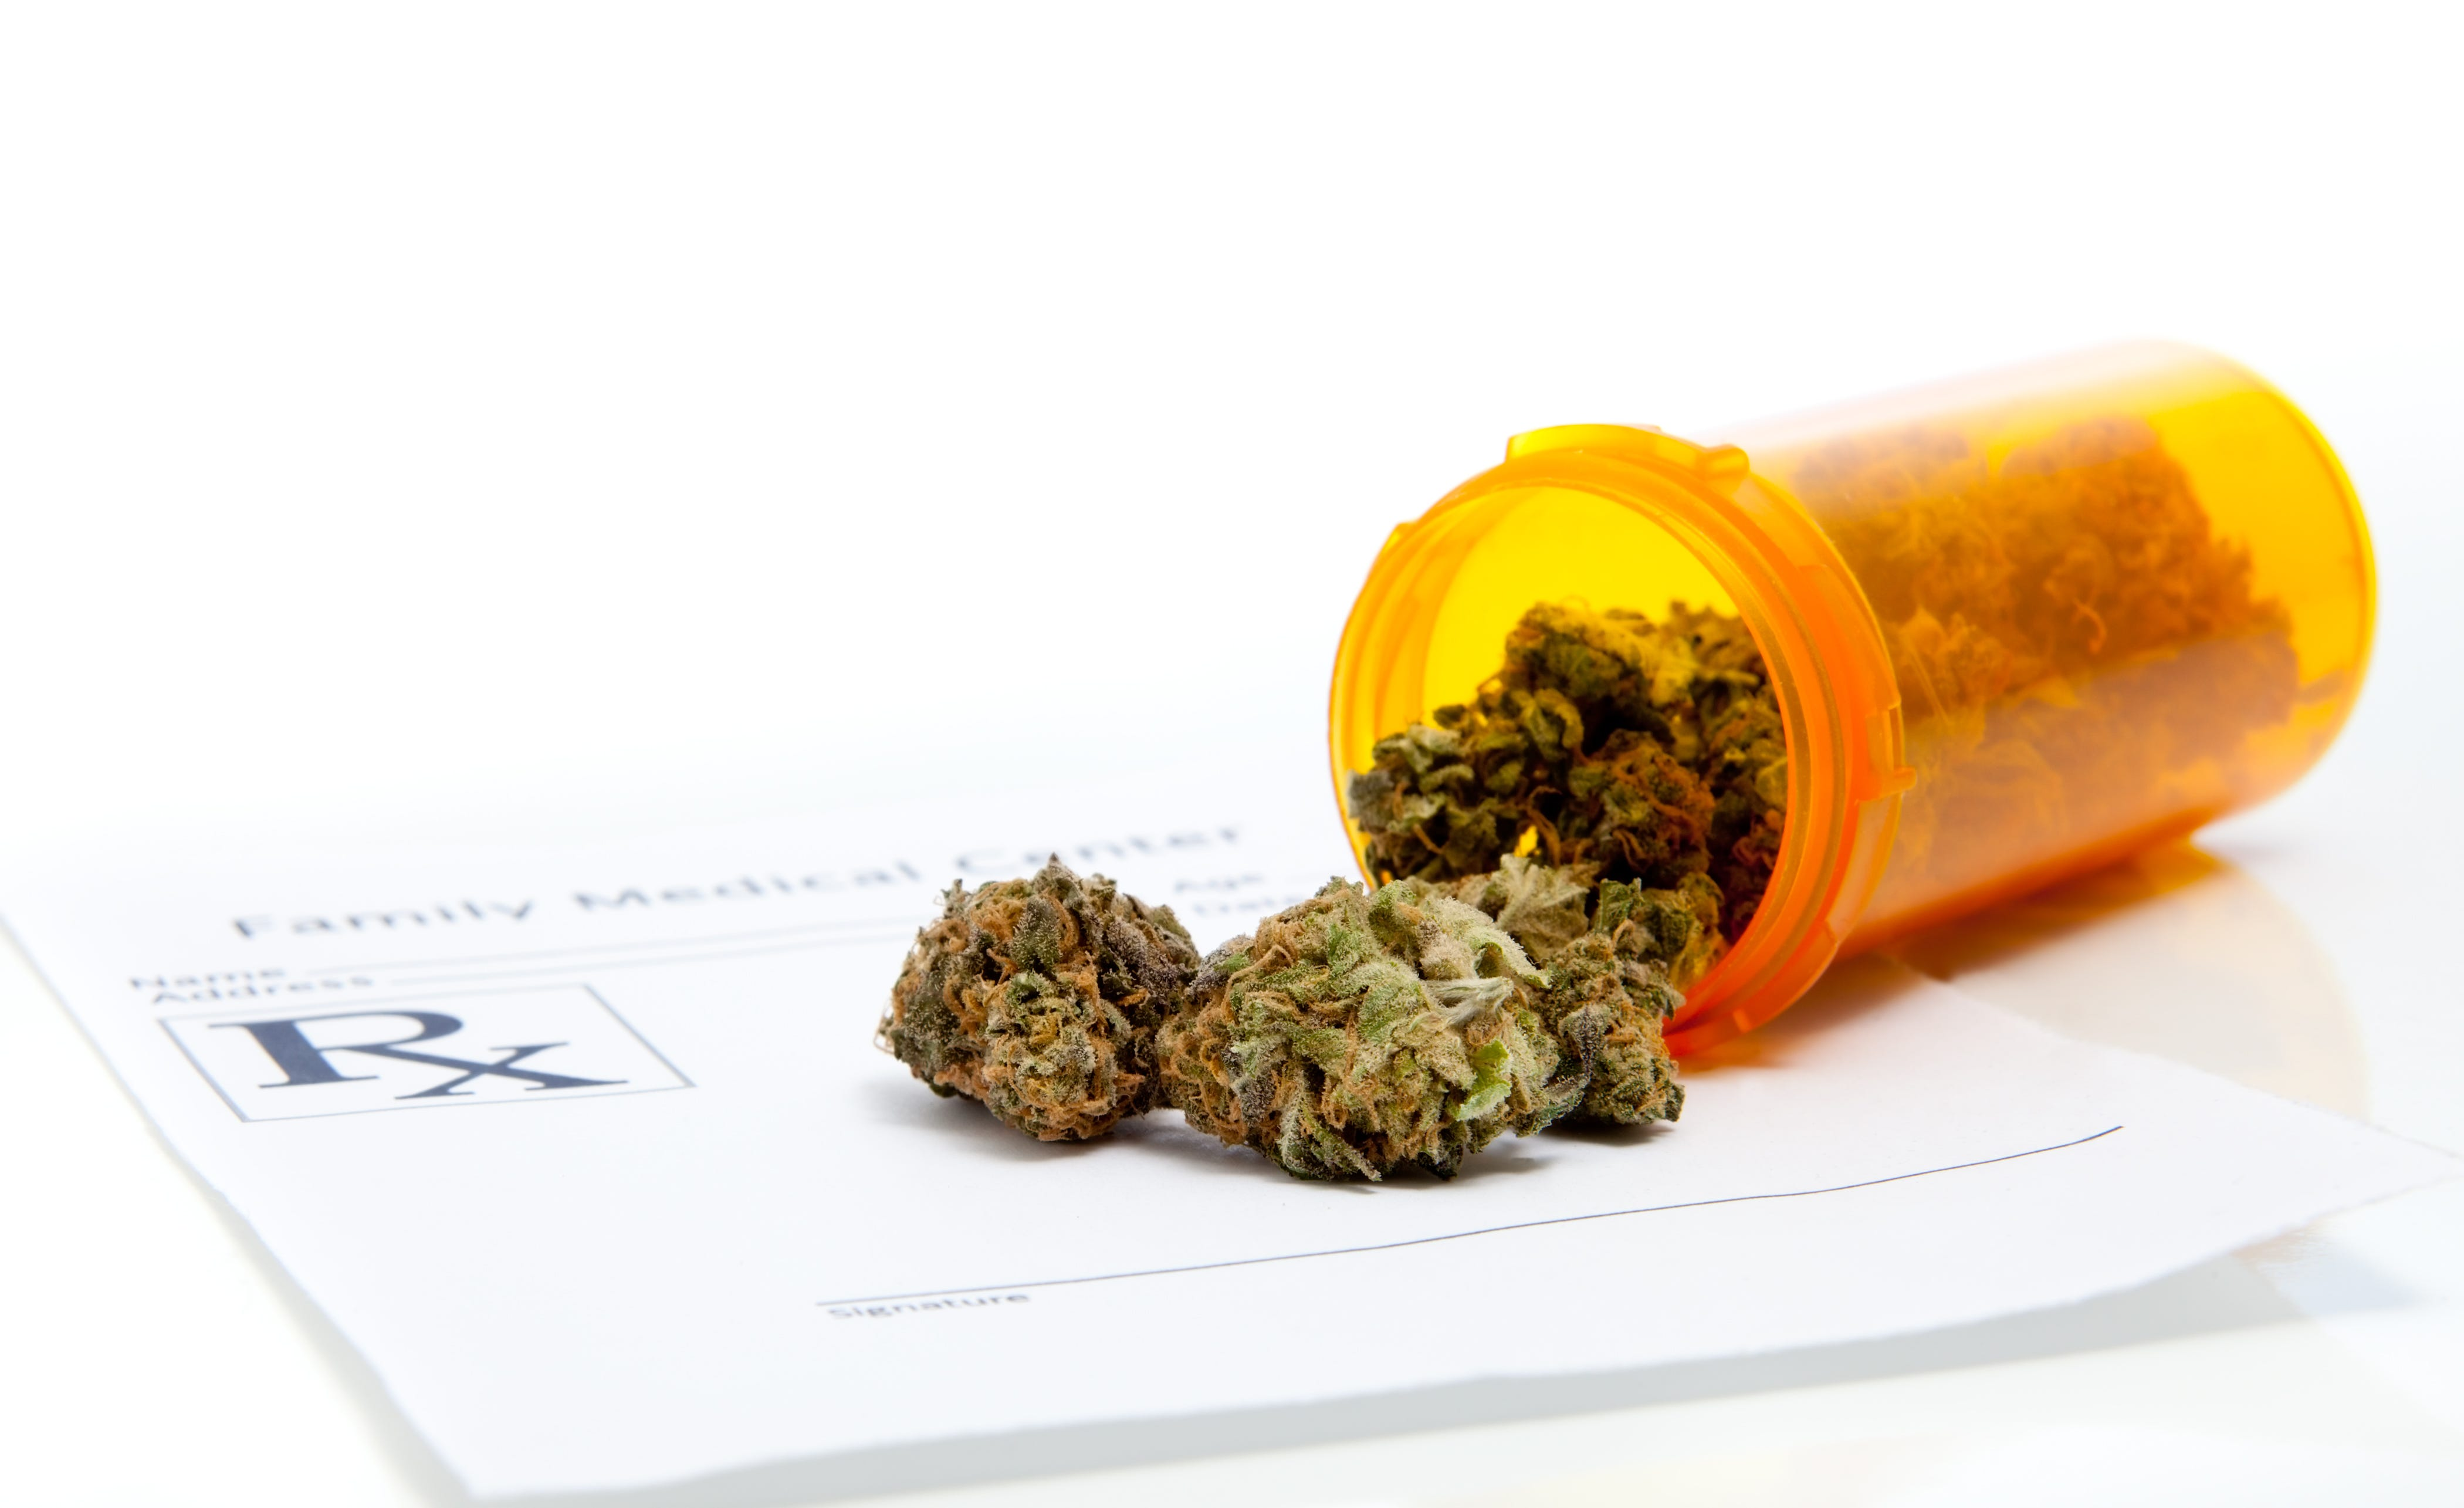 Marijuana legalization: Kentucky looks at recreational, medical use